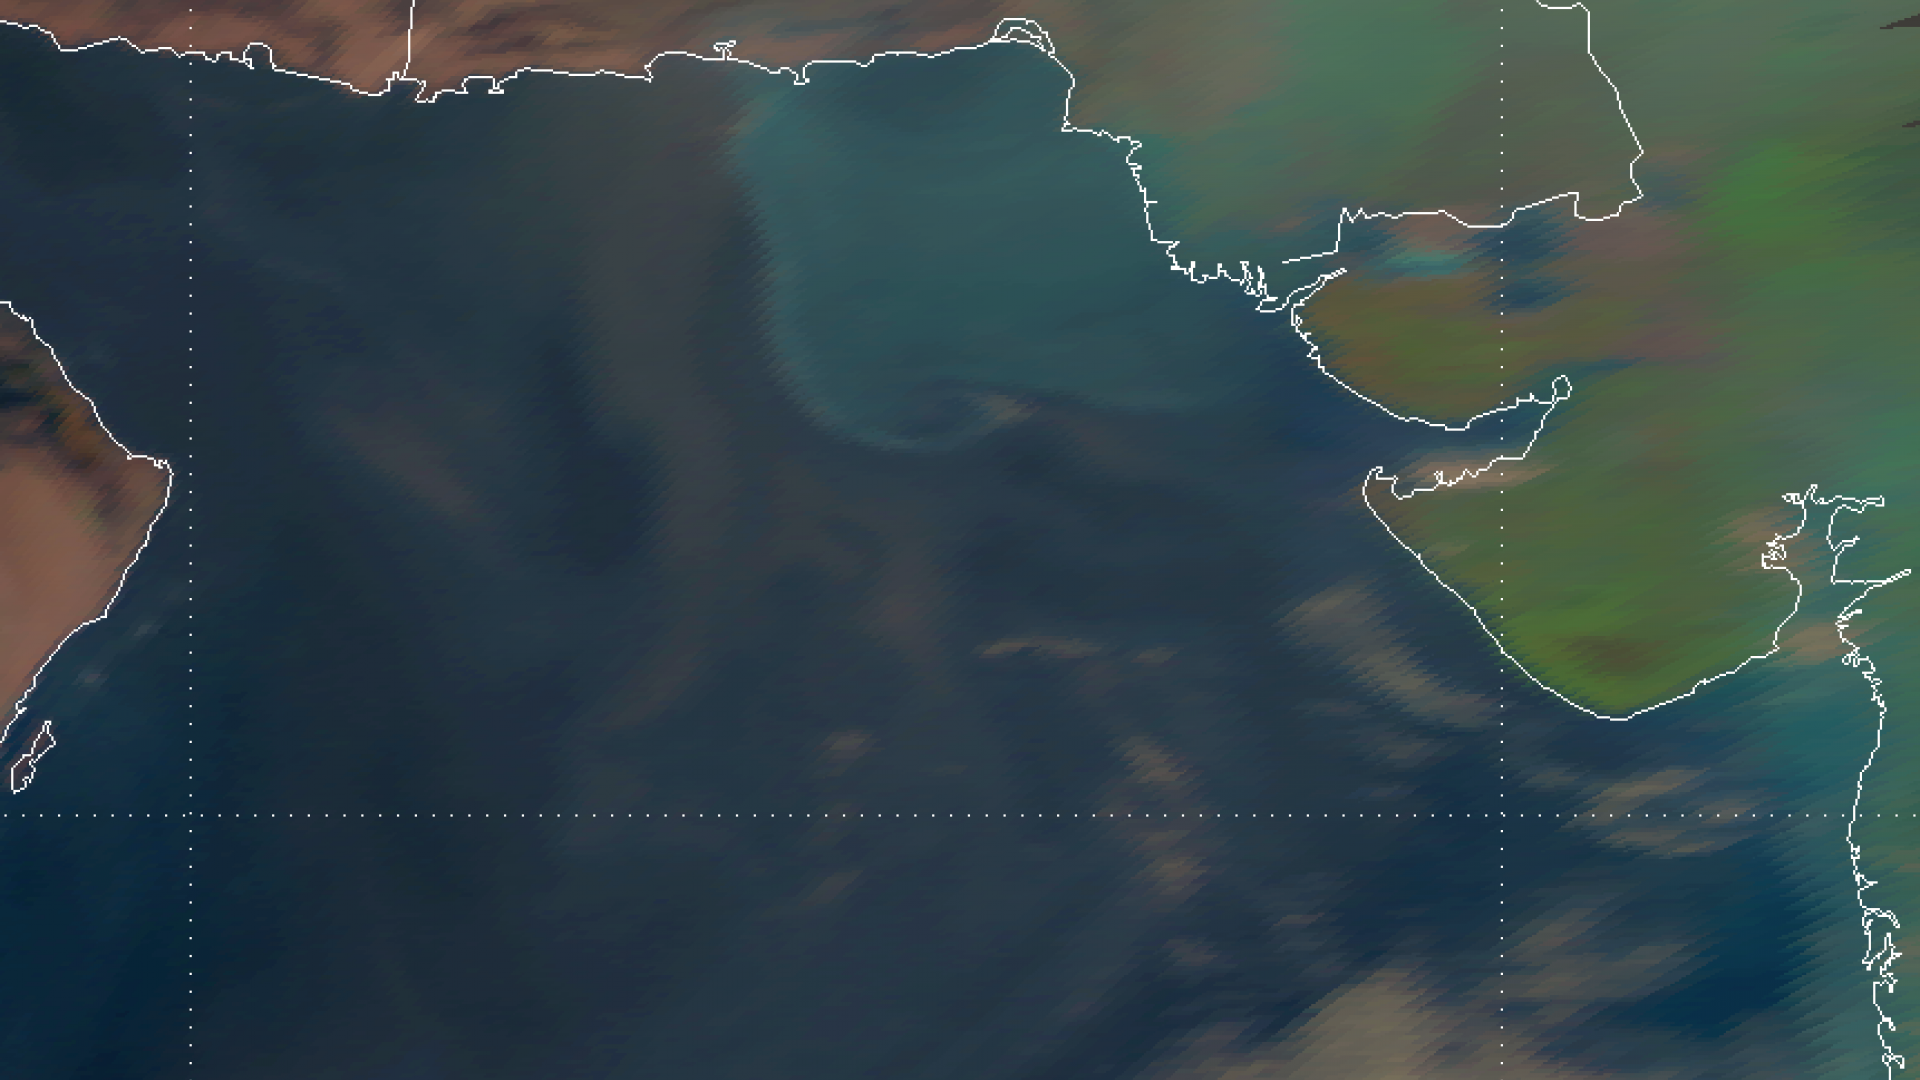 Haze veil on the Pakistani coast